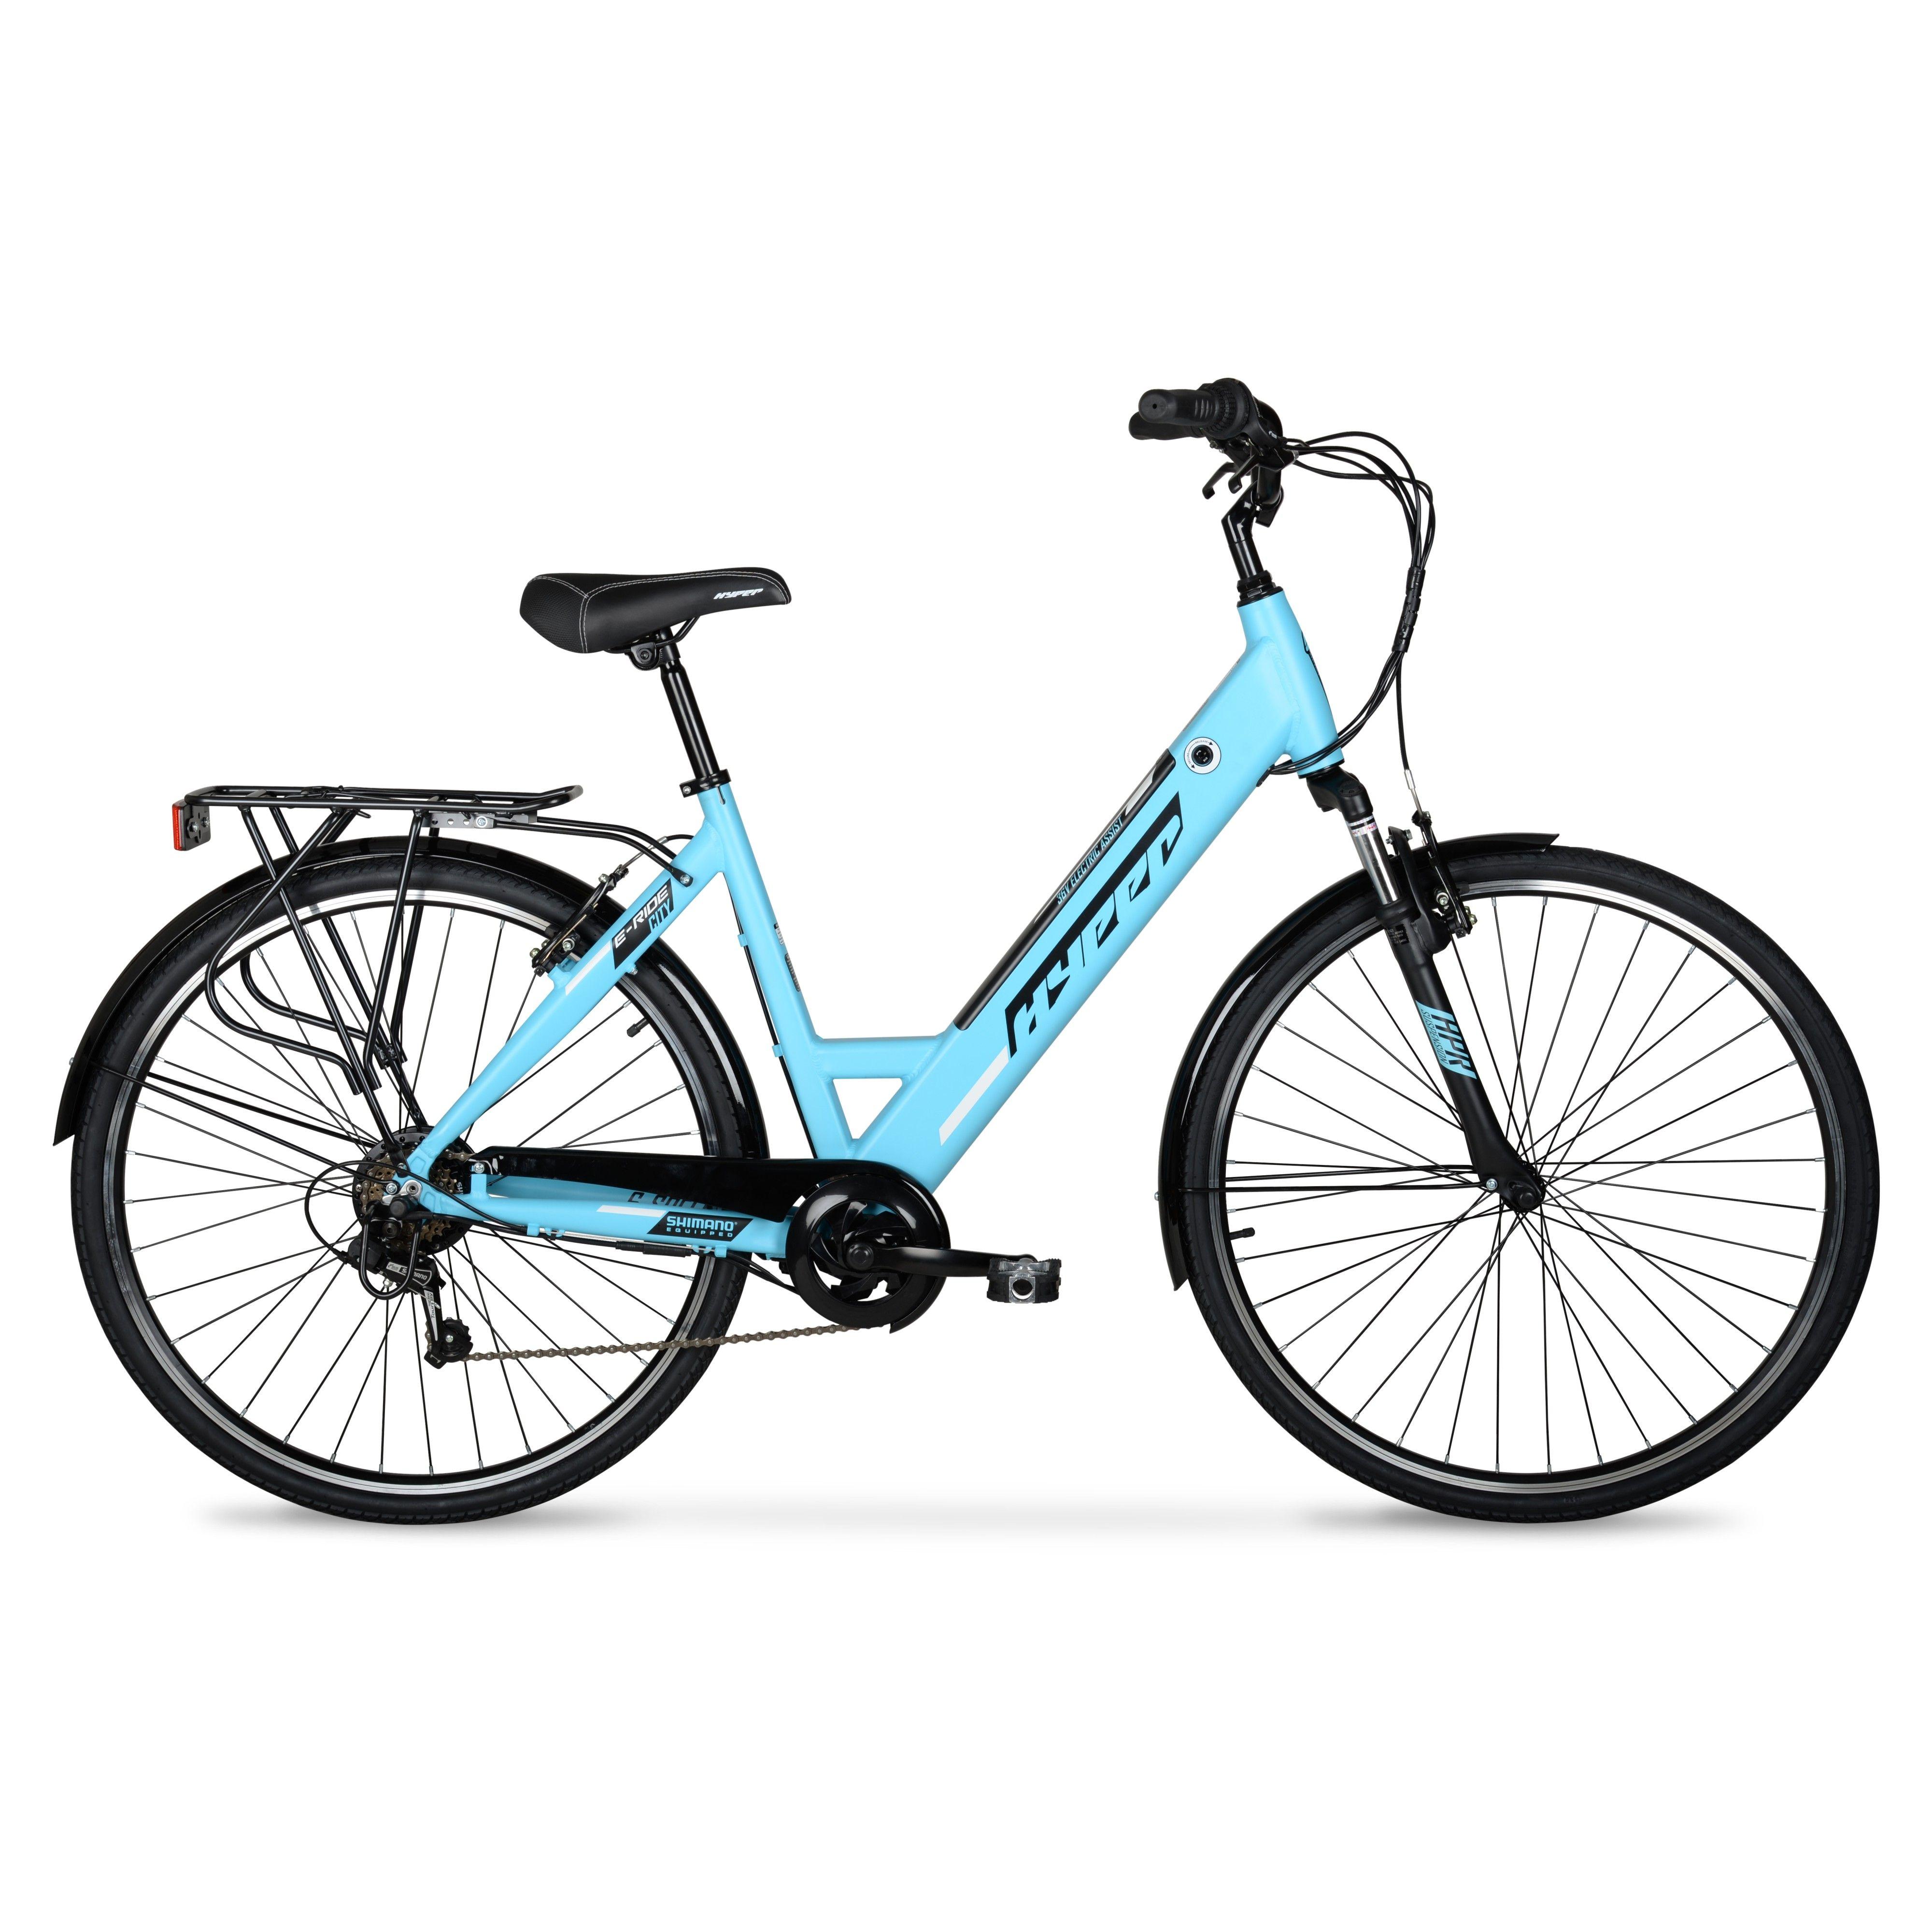 Sports & Outdoors Electric mountain bike, Commuter bike